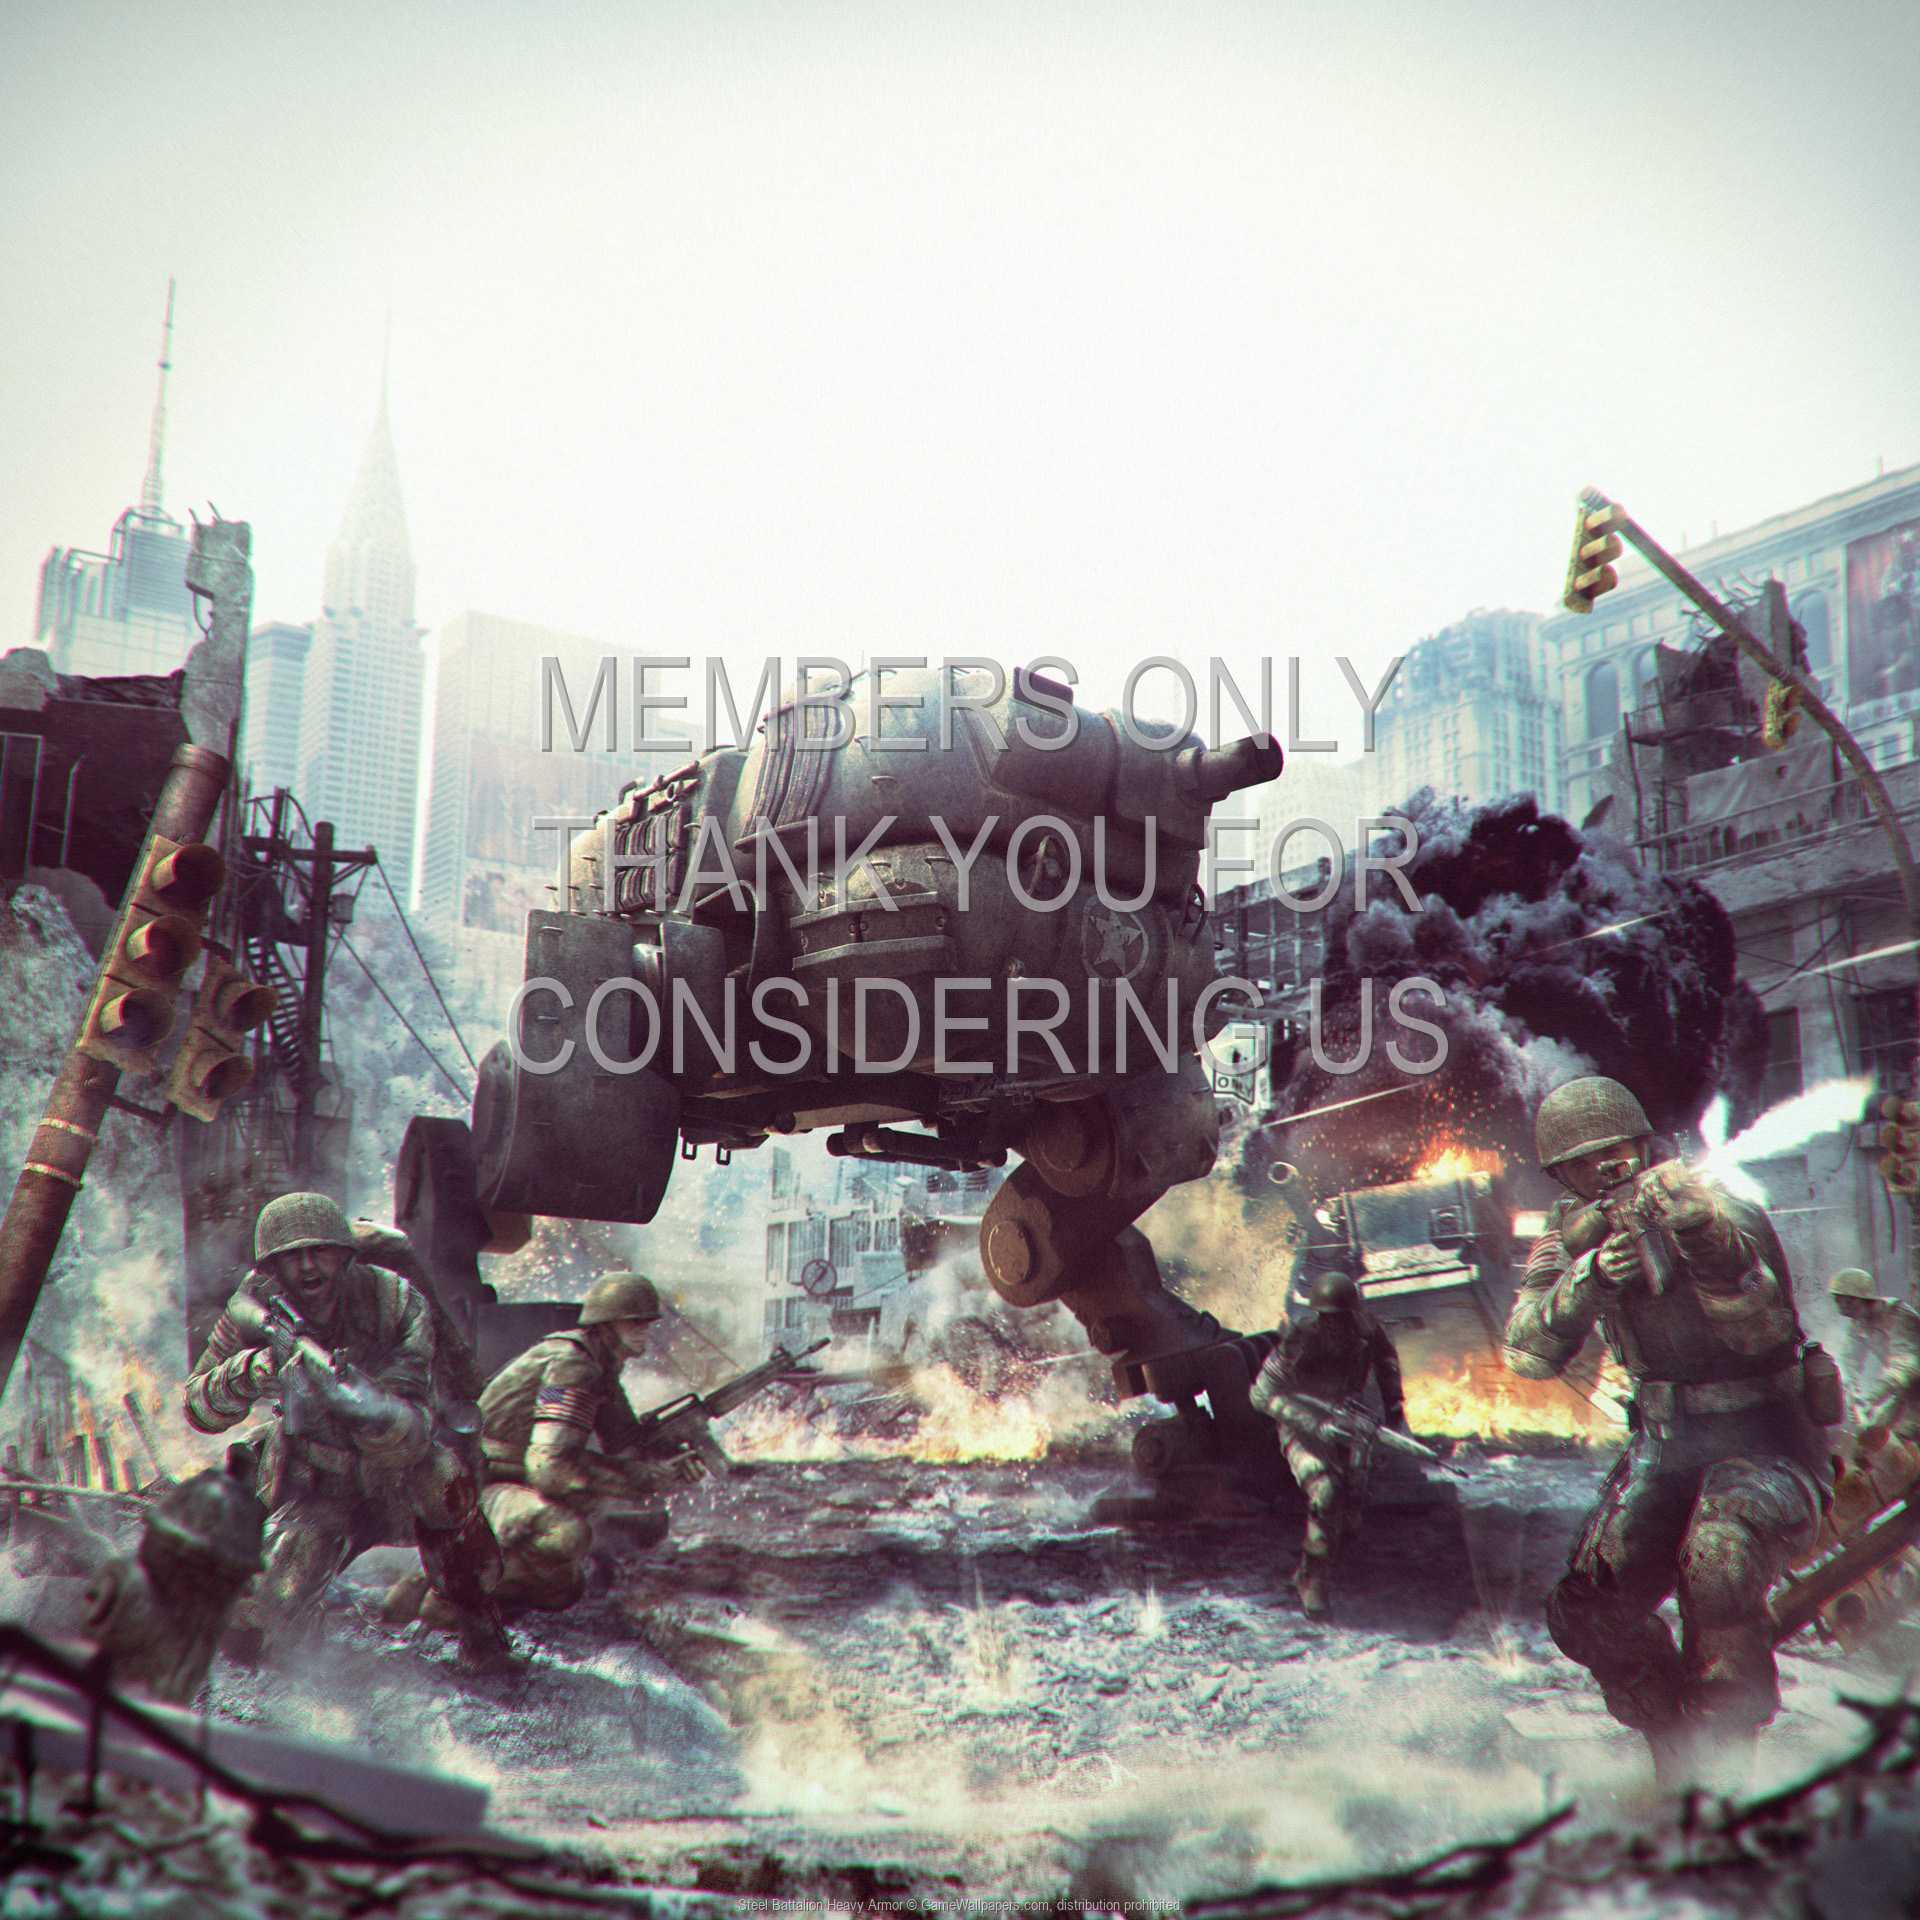 Steel Battalion Heavy Armor 1080p Horizontal Handy Hintergrundbild 01